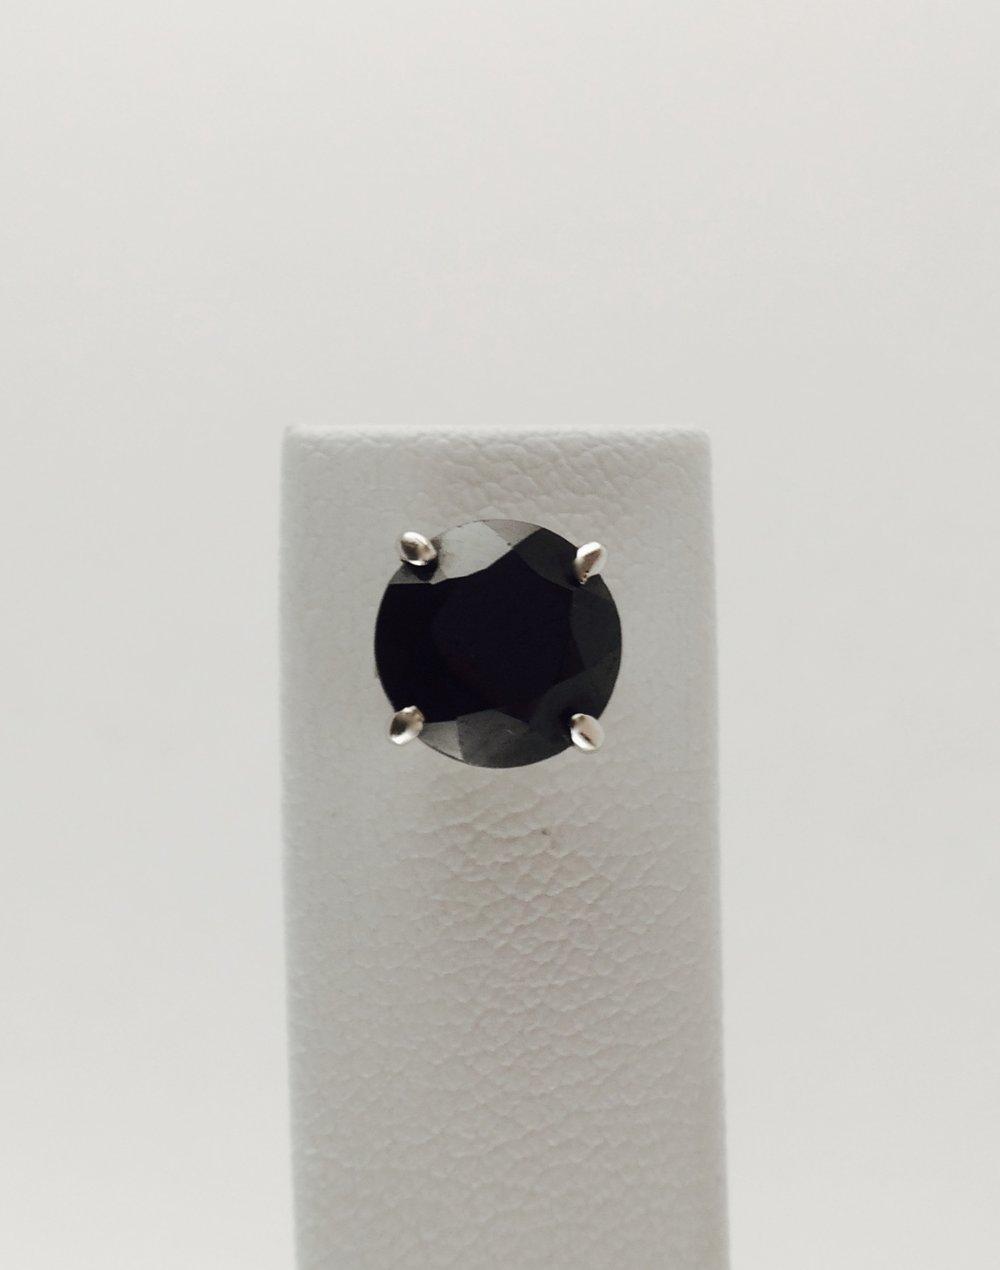 Image of Round Earring Stud Set